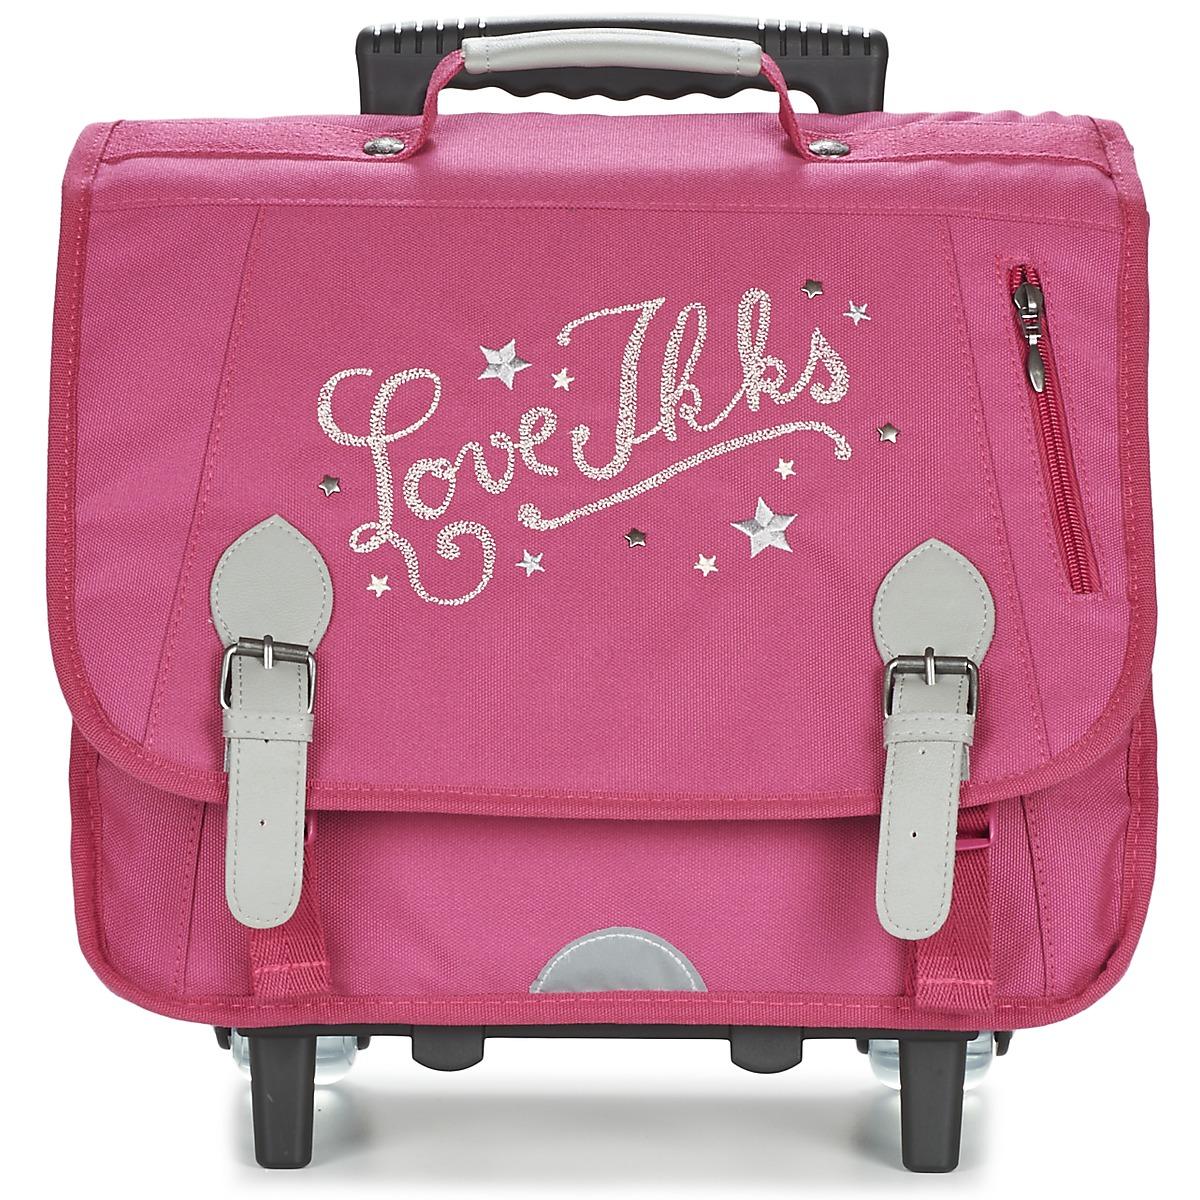 ikks love ikks trolley cartable 38cm rose livraison gratuite avec sacs sacs. Black Bedroom Furniture Sets. Home Design Ideas